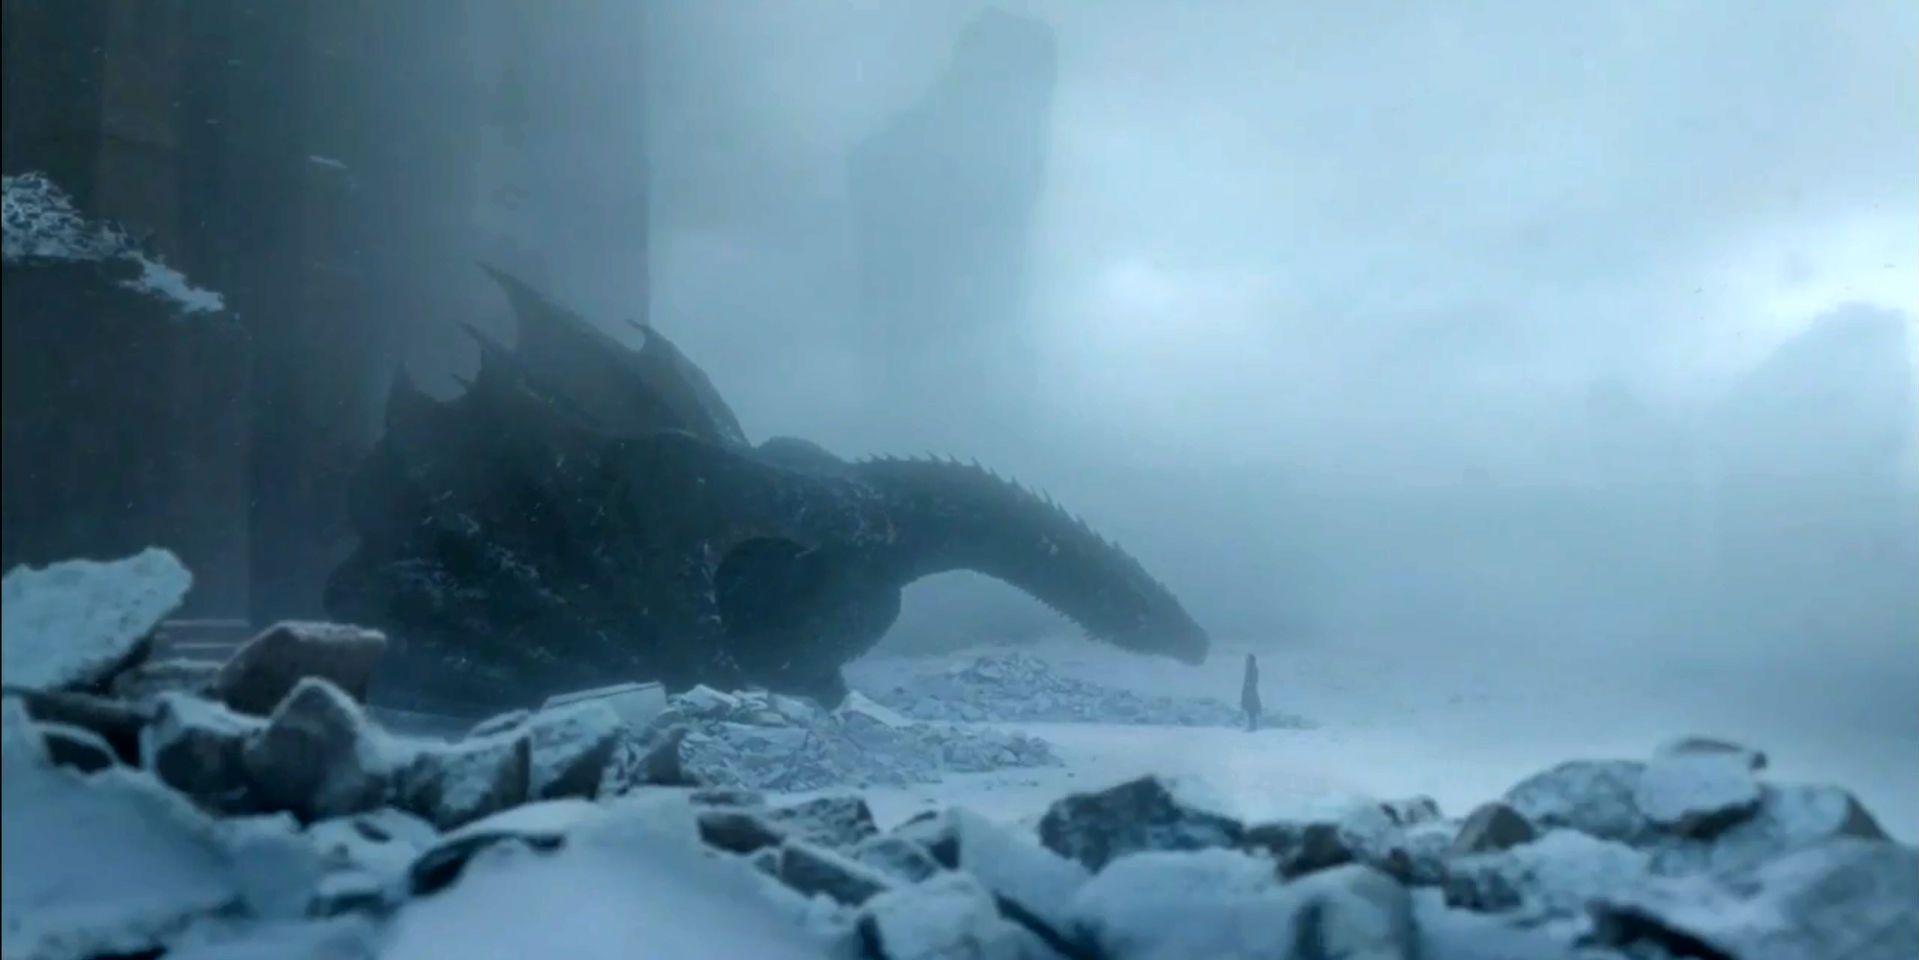 https://static1.srcdn.com/wordpress/wp-content/uploads/2019/05/Game-of-Thrones-Finale-Drogon-and-Jon.jpg